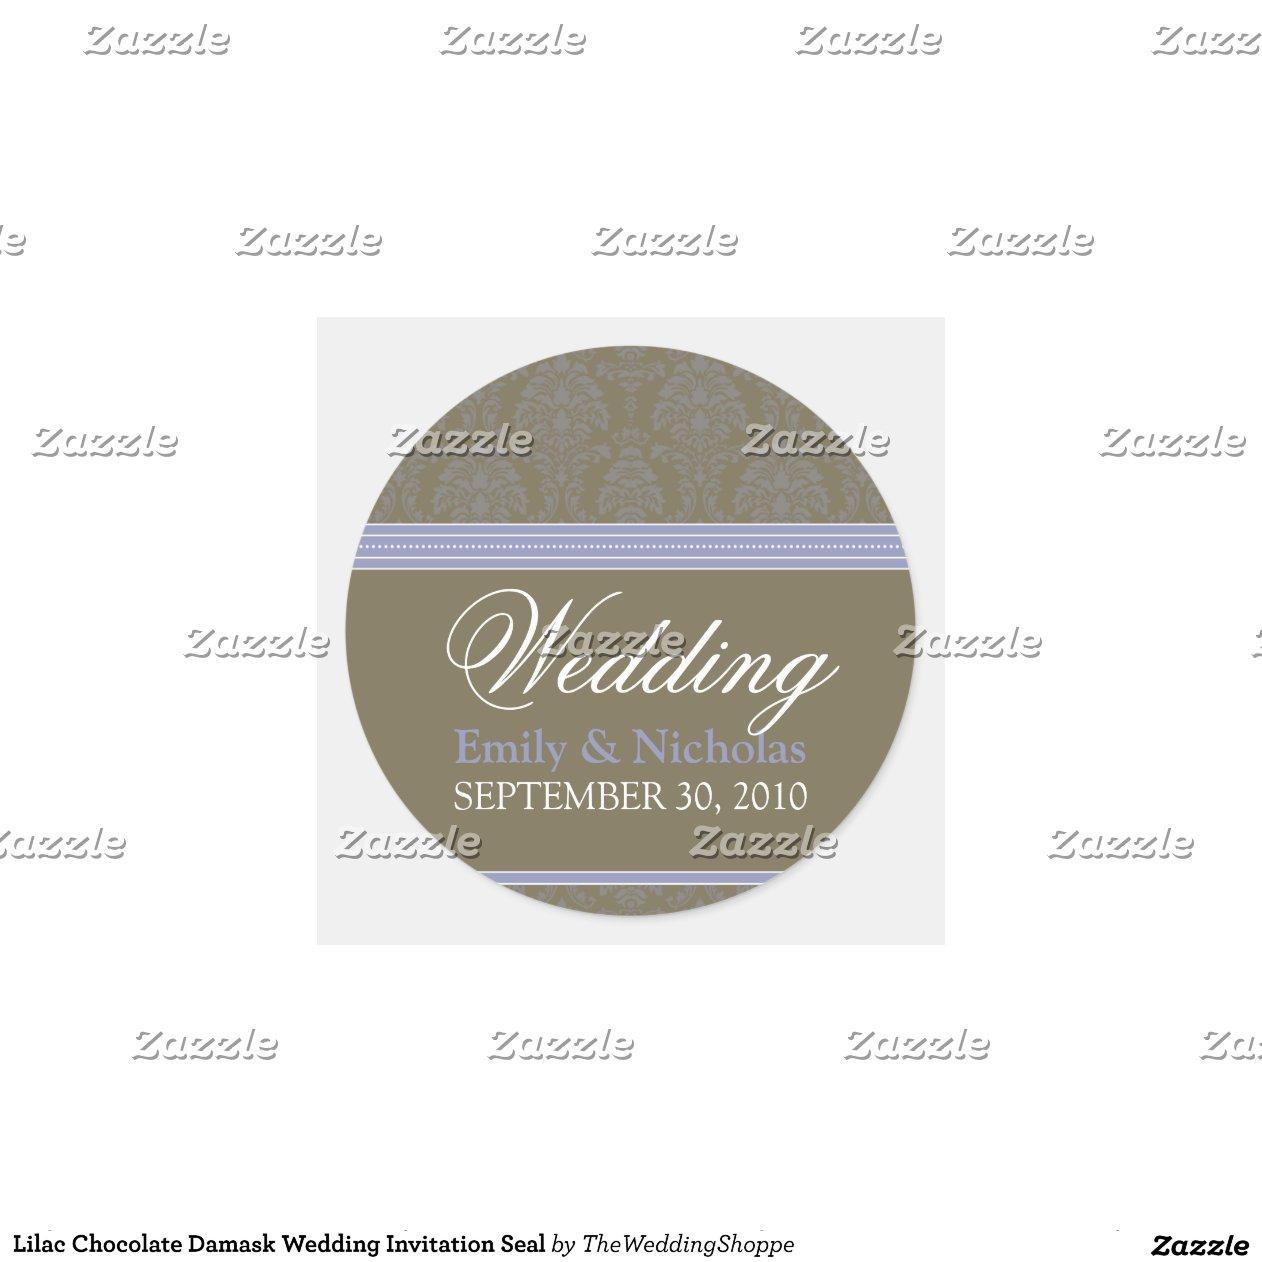 Lilac Chocolate Damask Wedding Invitation Seal Round Sticker